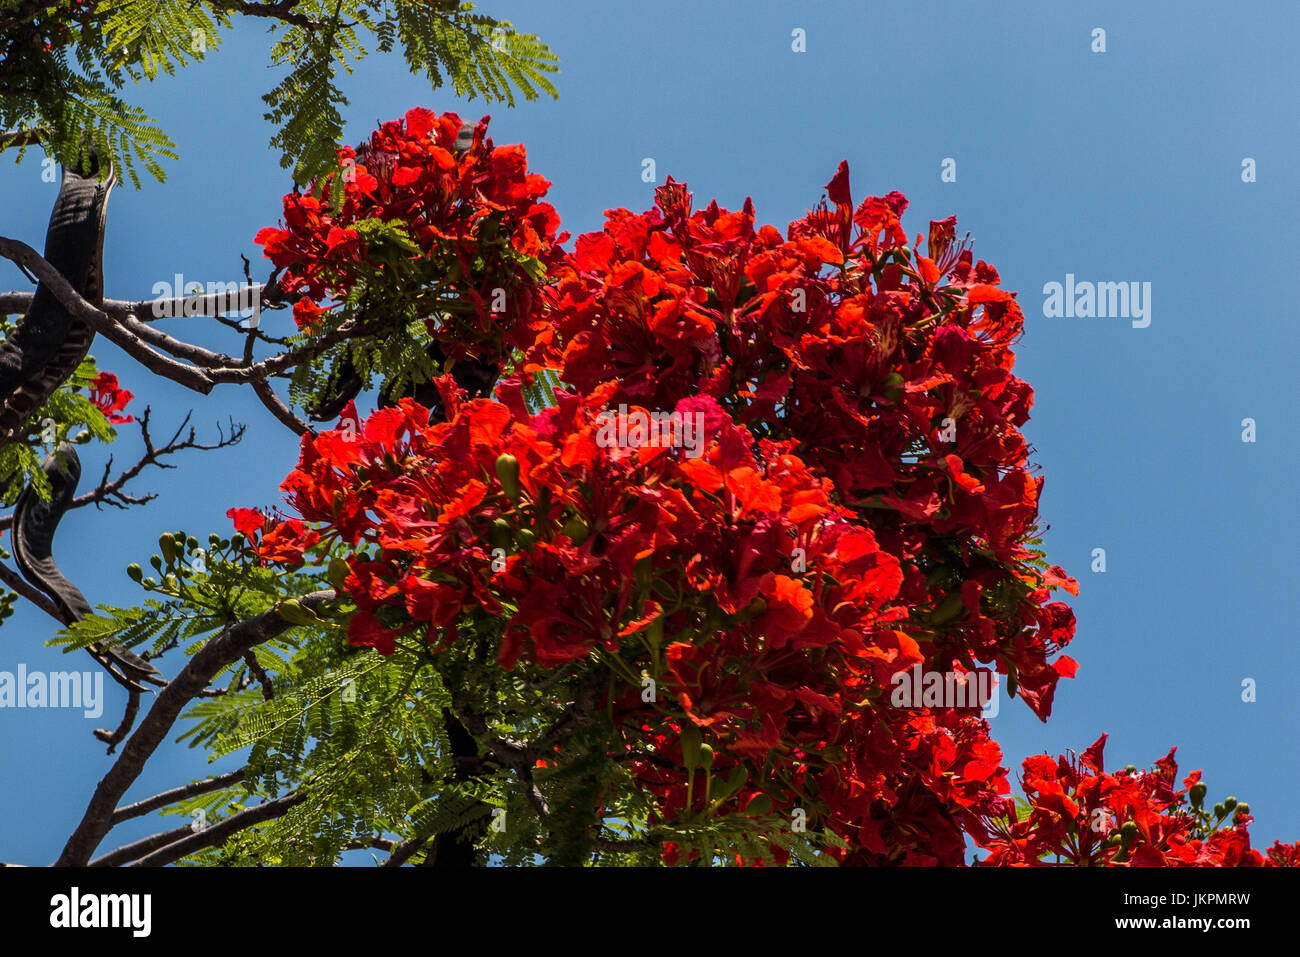 Red Flamboyant tree Sapa Valley northern Vietnam - Stock Image